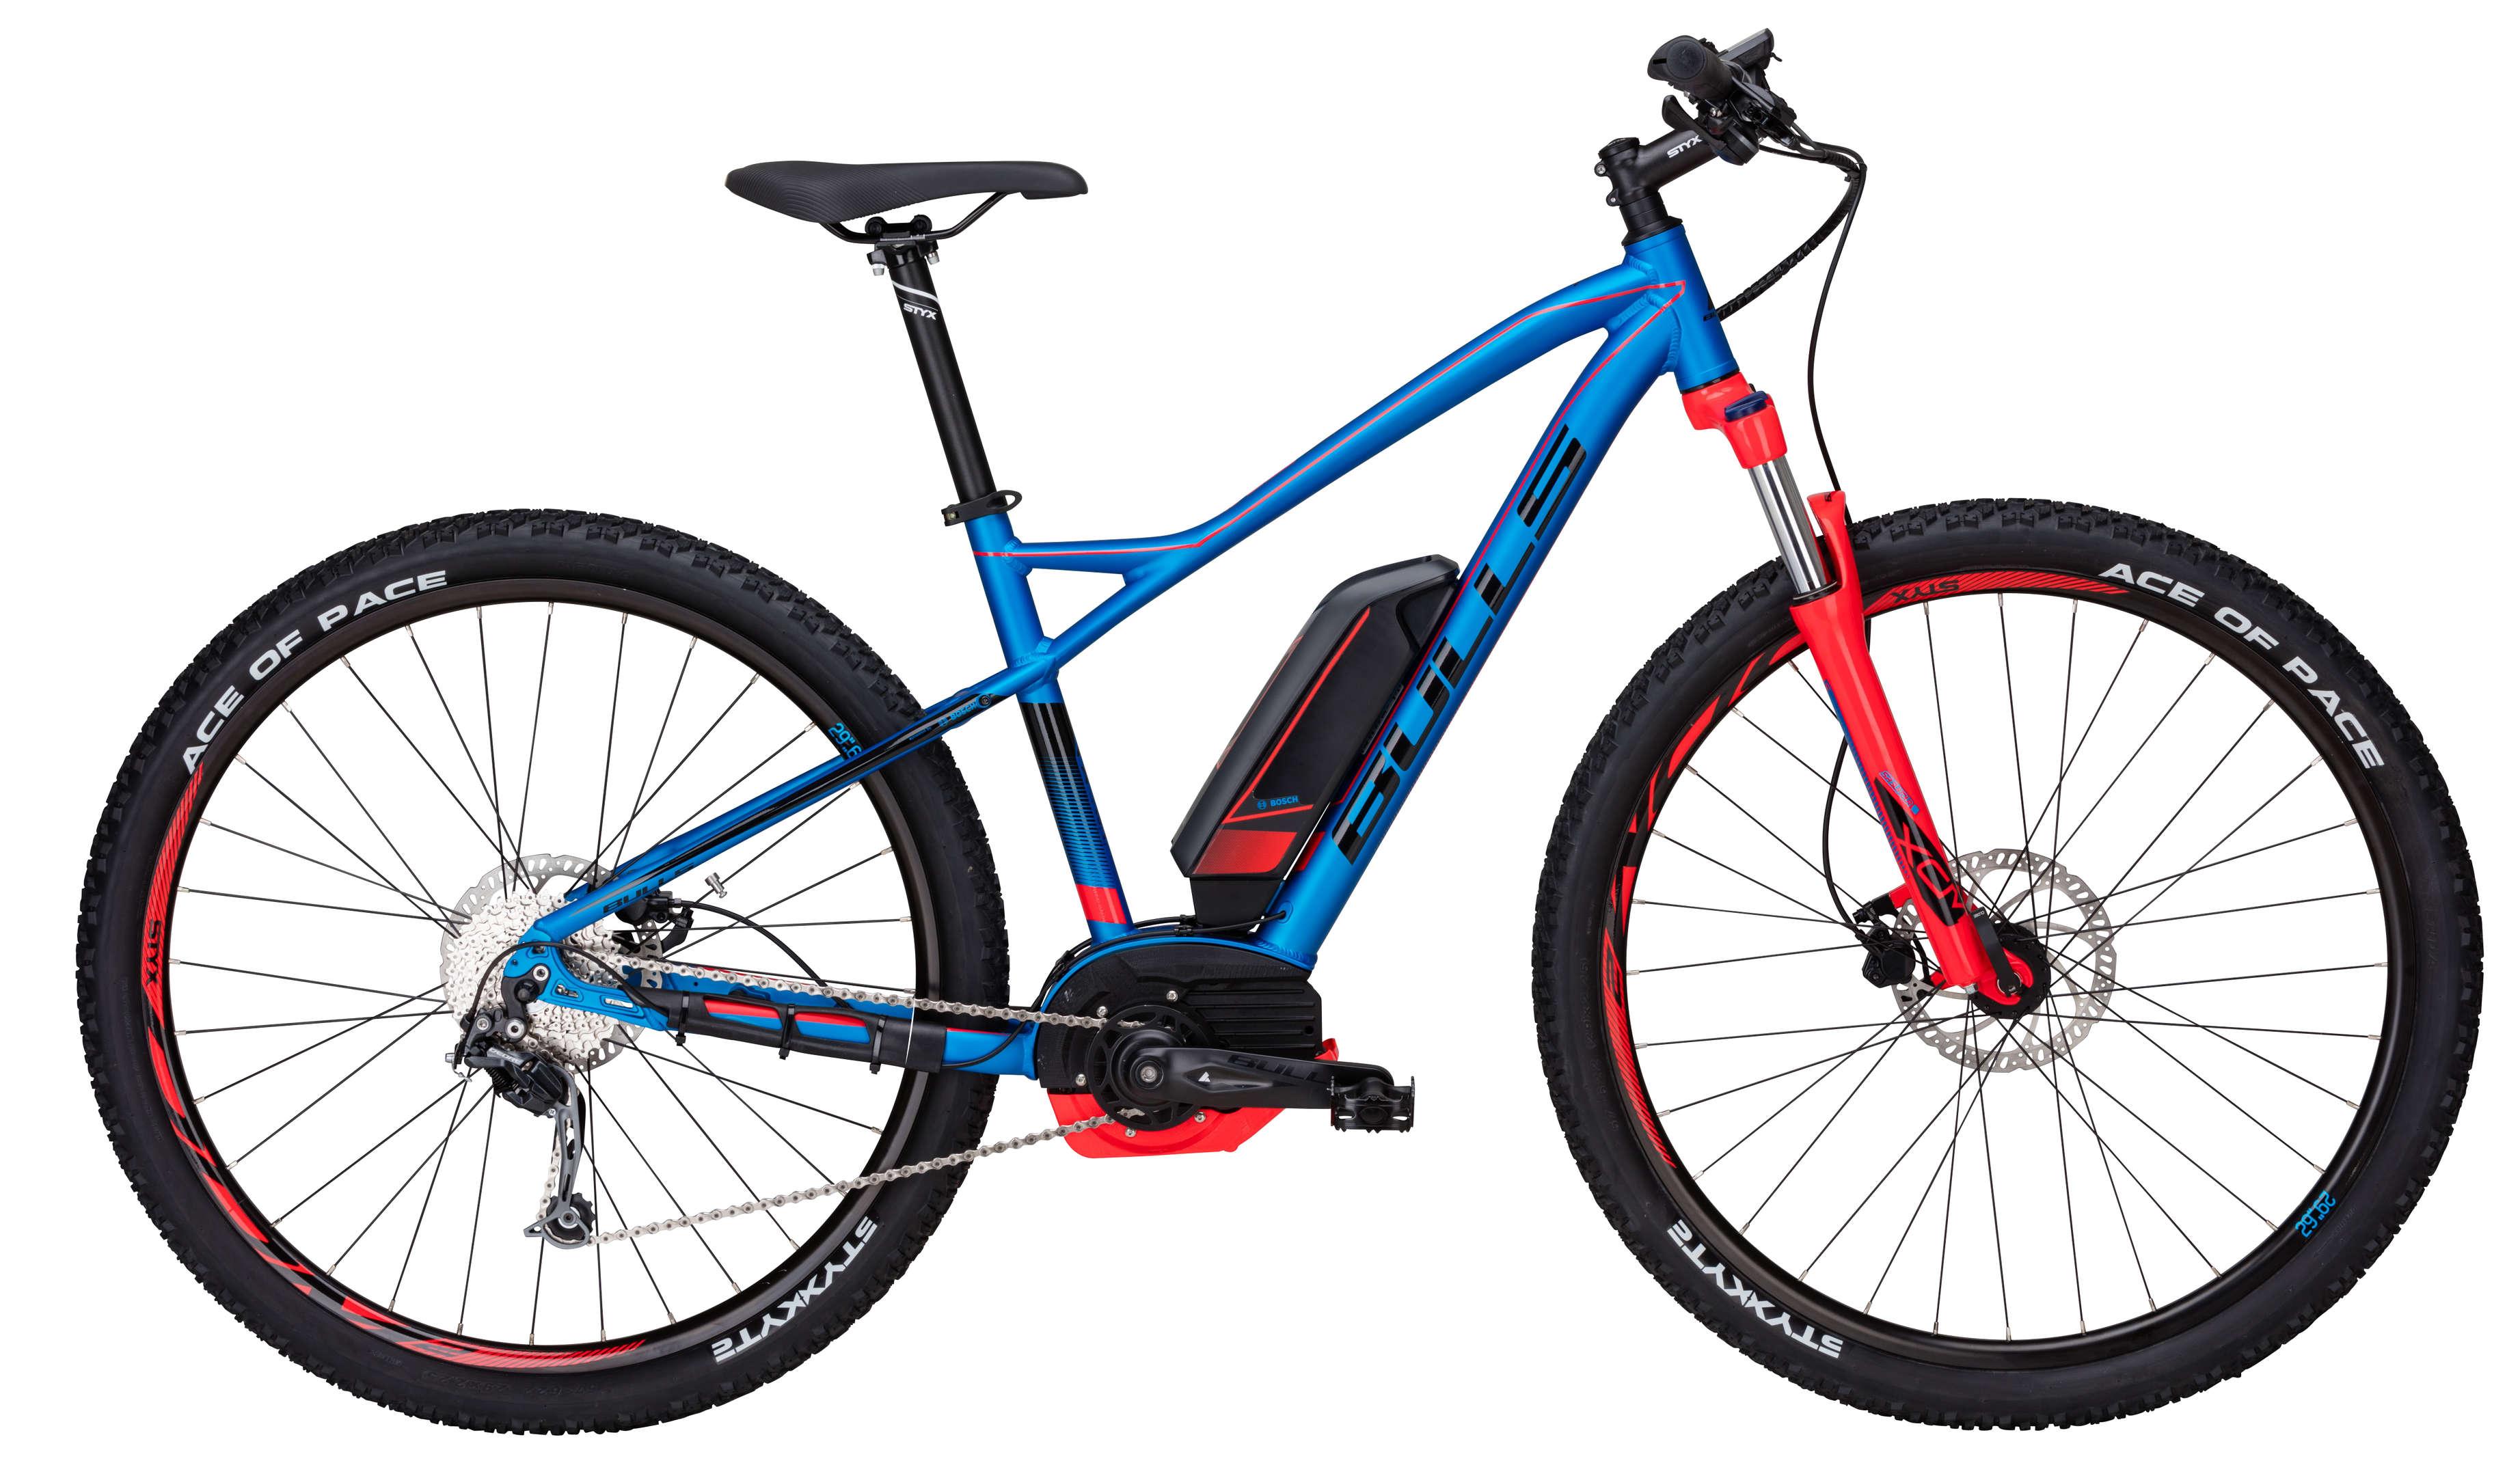 BULLS E-Bike Twenty9 E1 CX|BULLS E-Bike TWENTY9 E1 CX